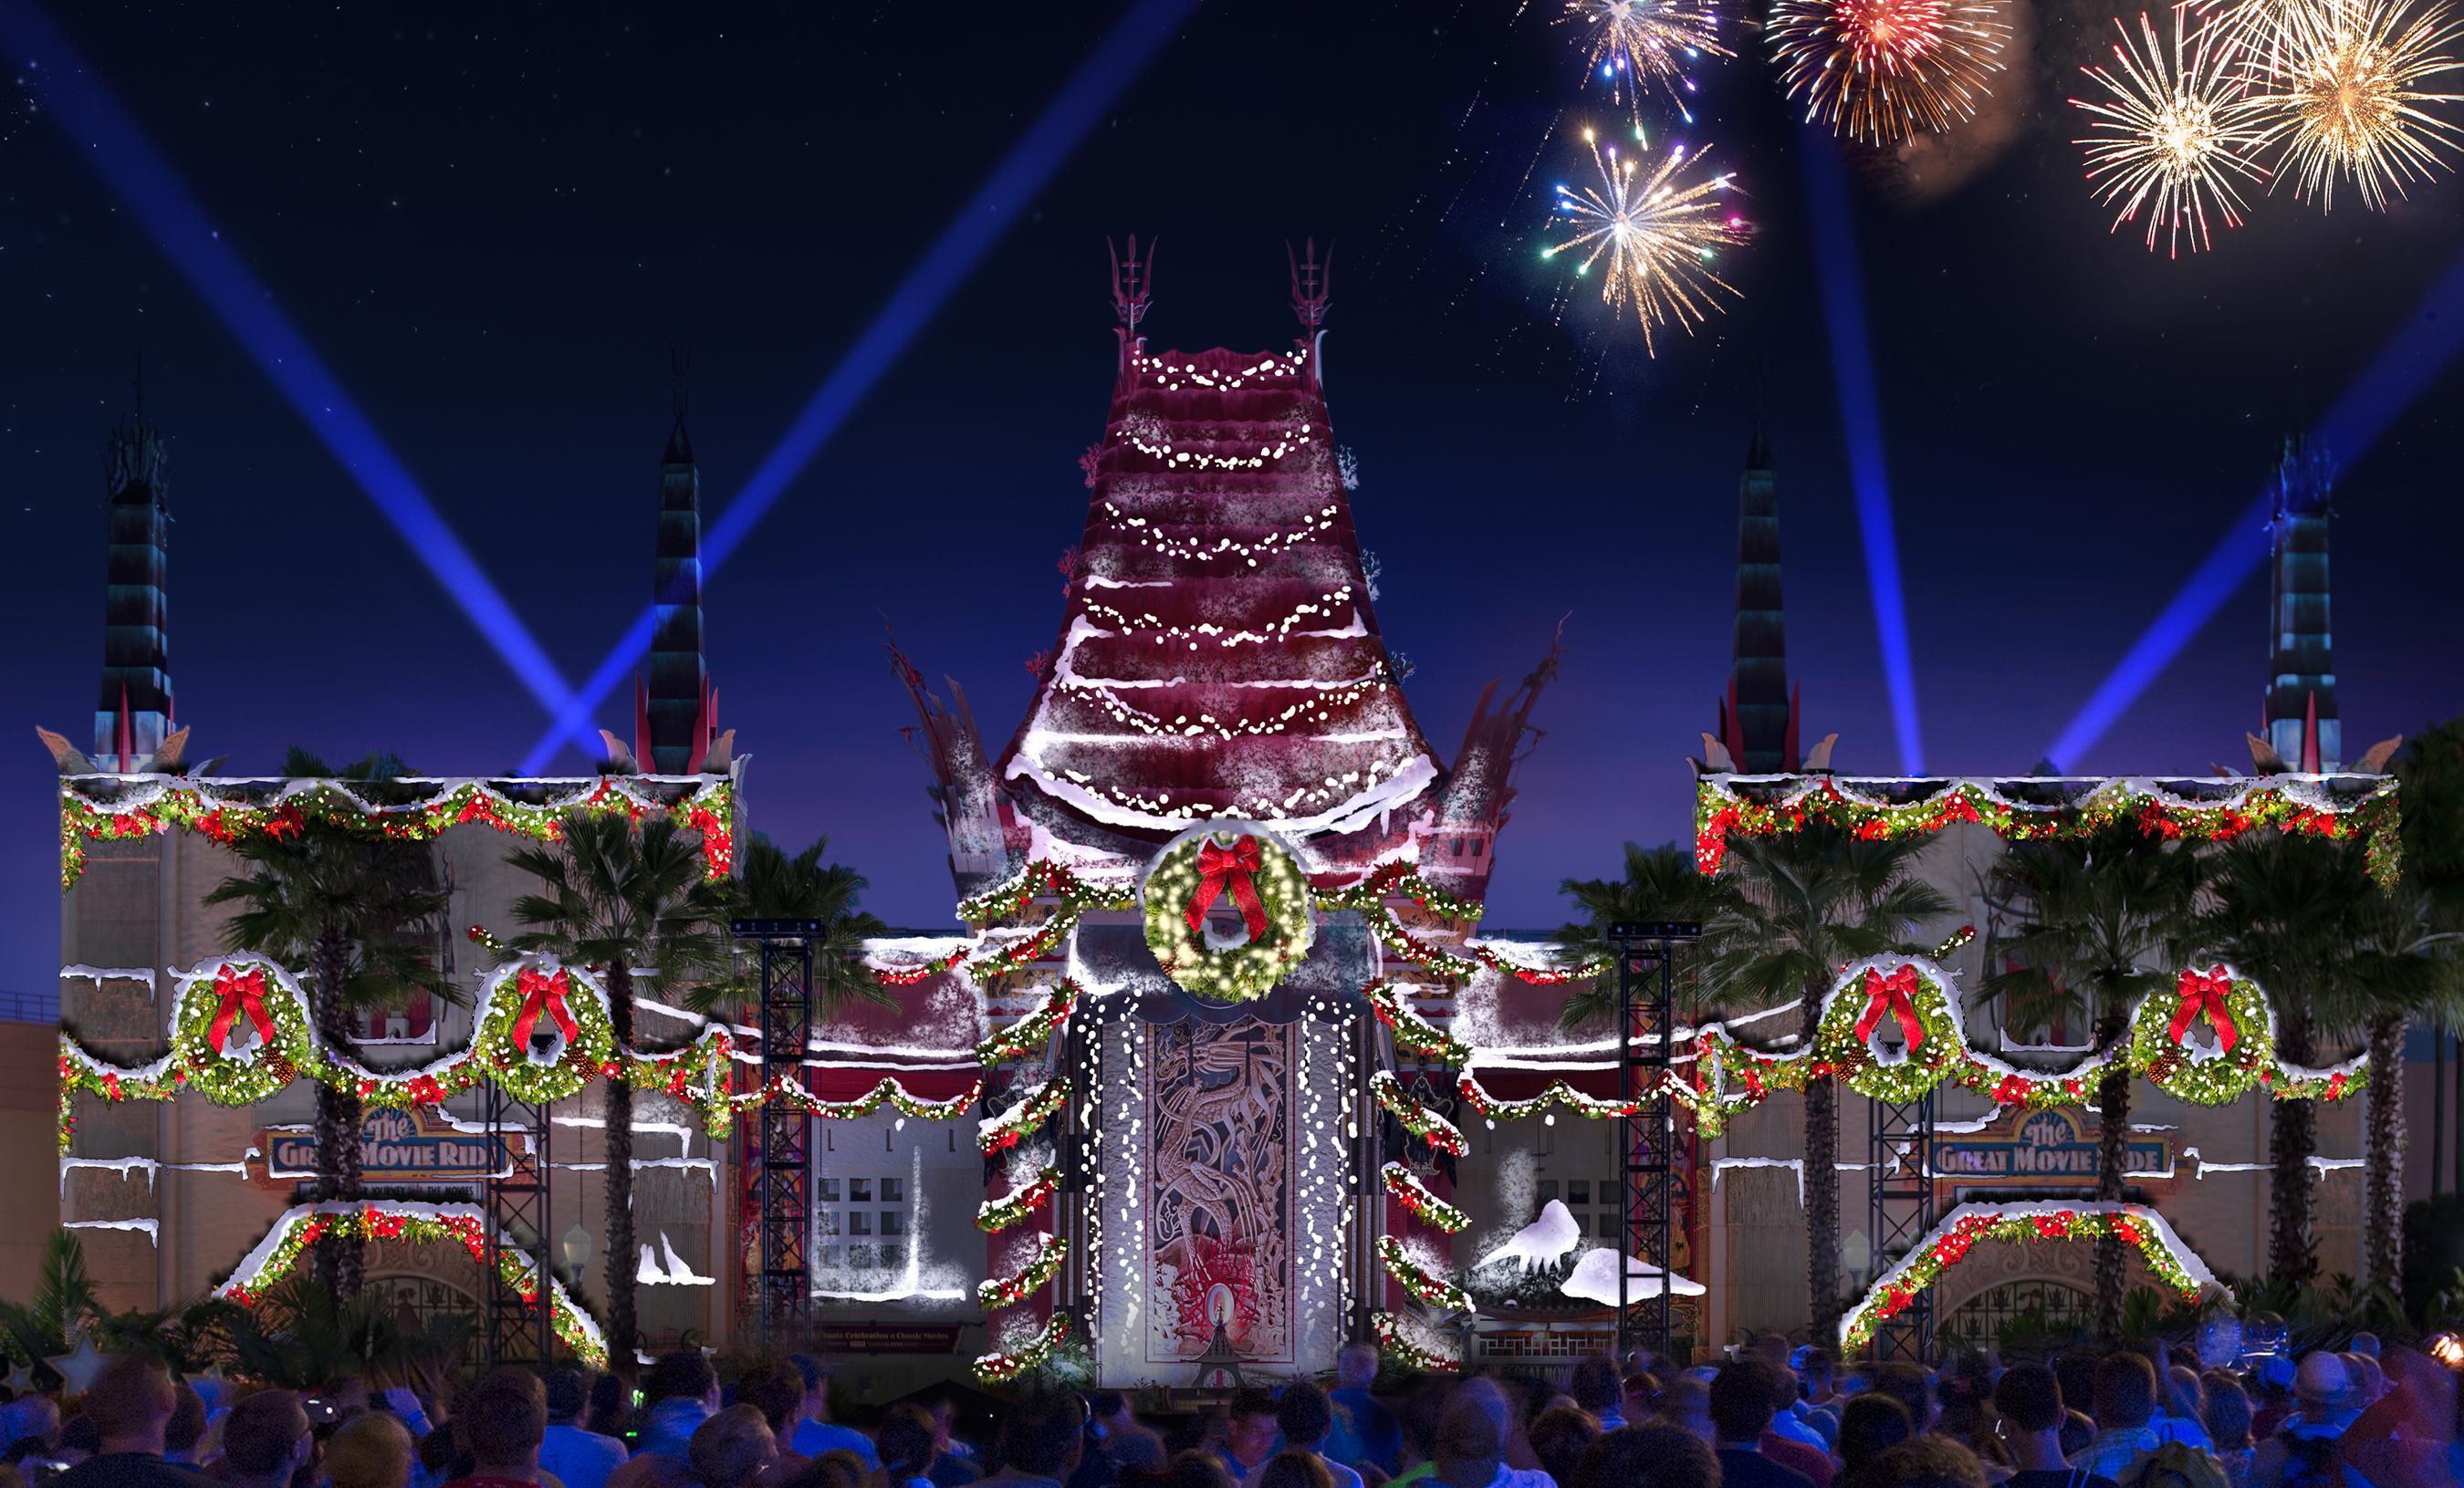 Jingle Bell, Jingle BAM! concept art